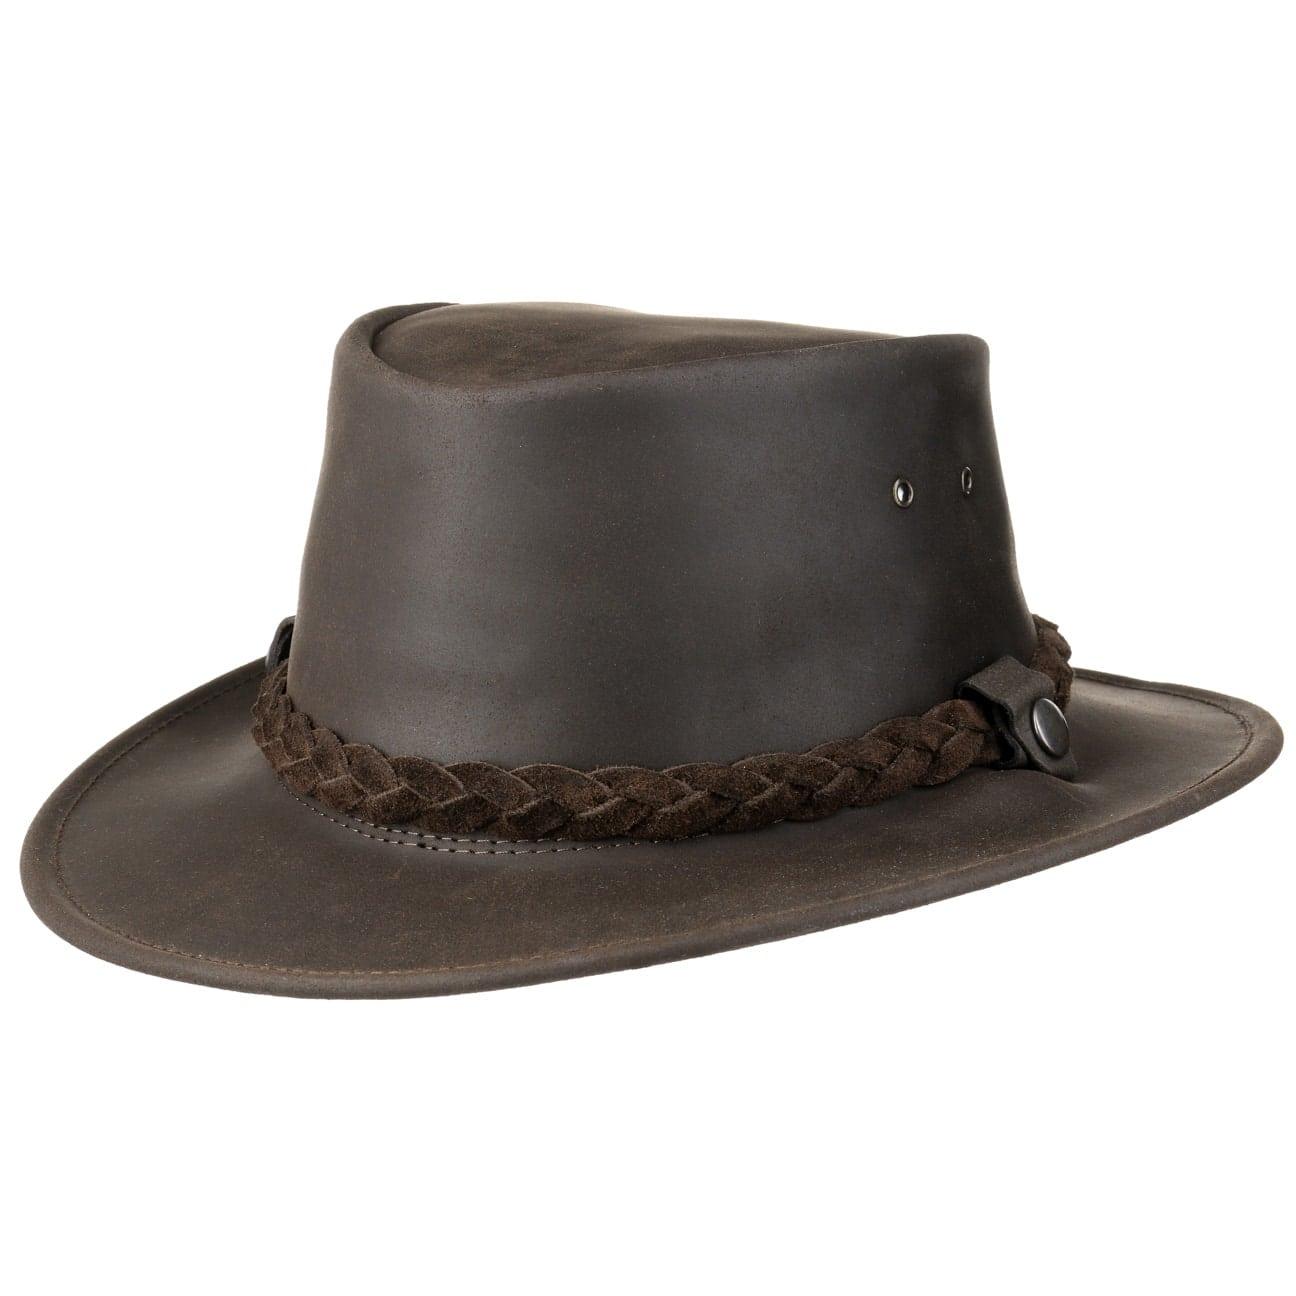 Chapeau en Cuir Highlander Oil by Jacaru  chapeau en cuir naturel